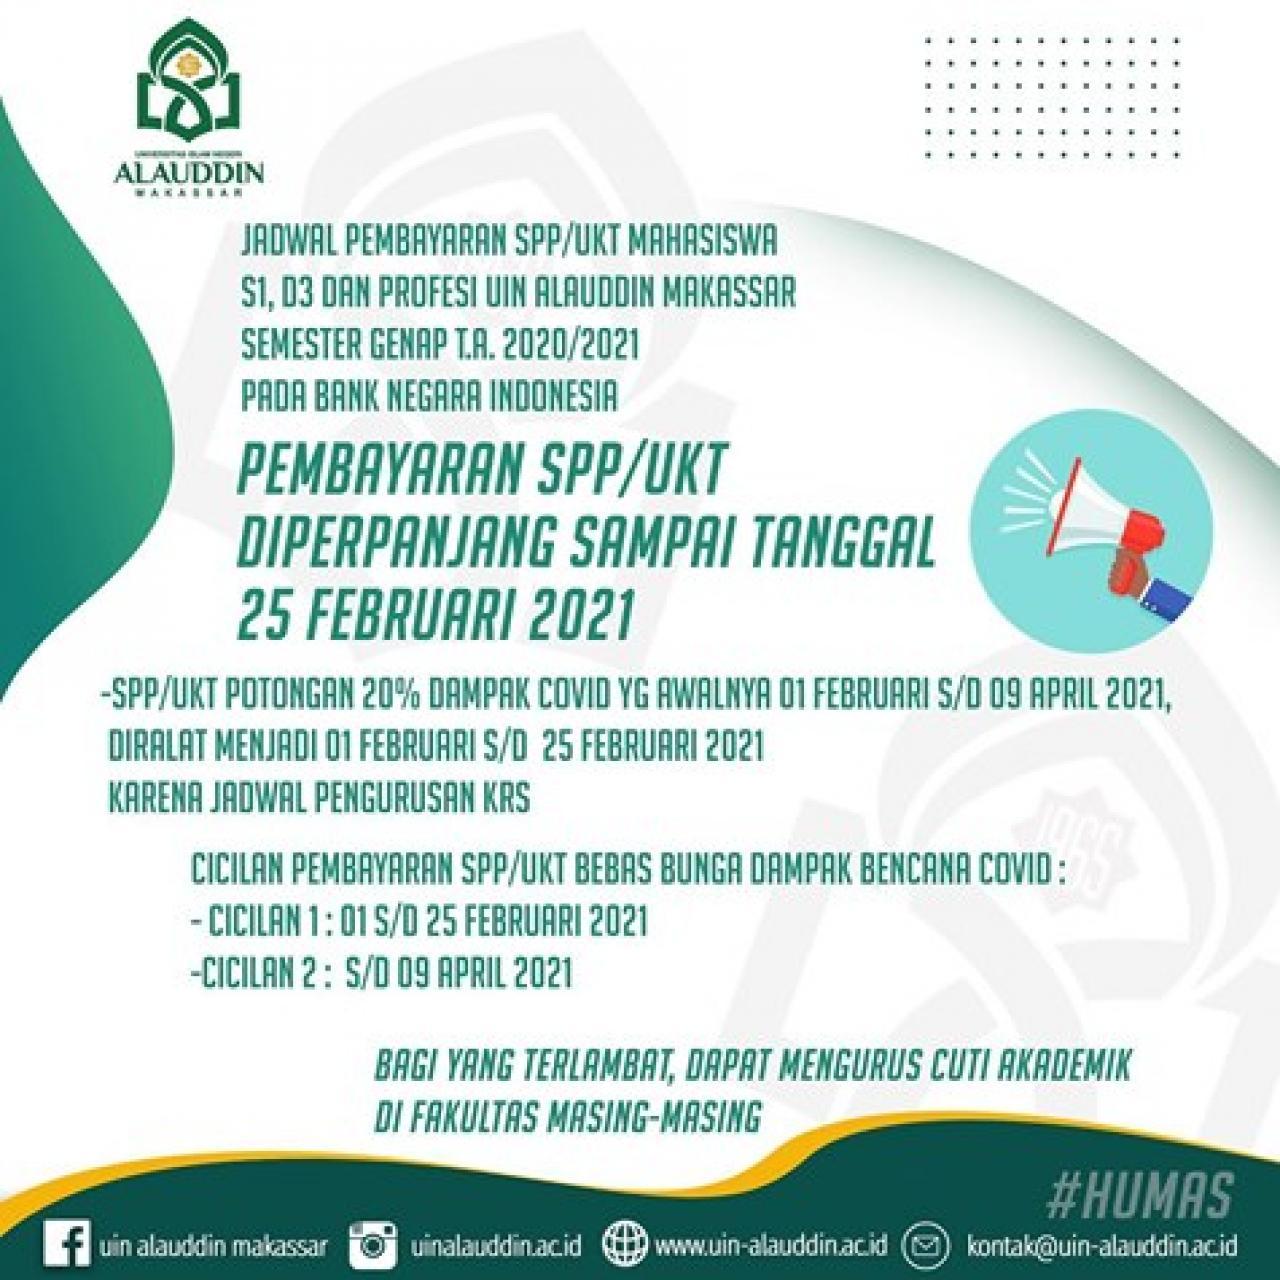 Pembayaran UKT UIN Alauddin Semester Genap TA 2020/2021 Diperpanjang